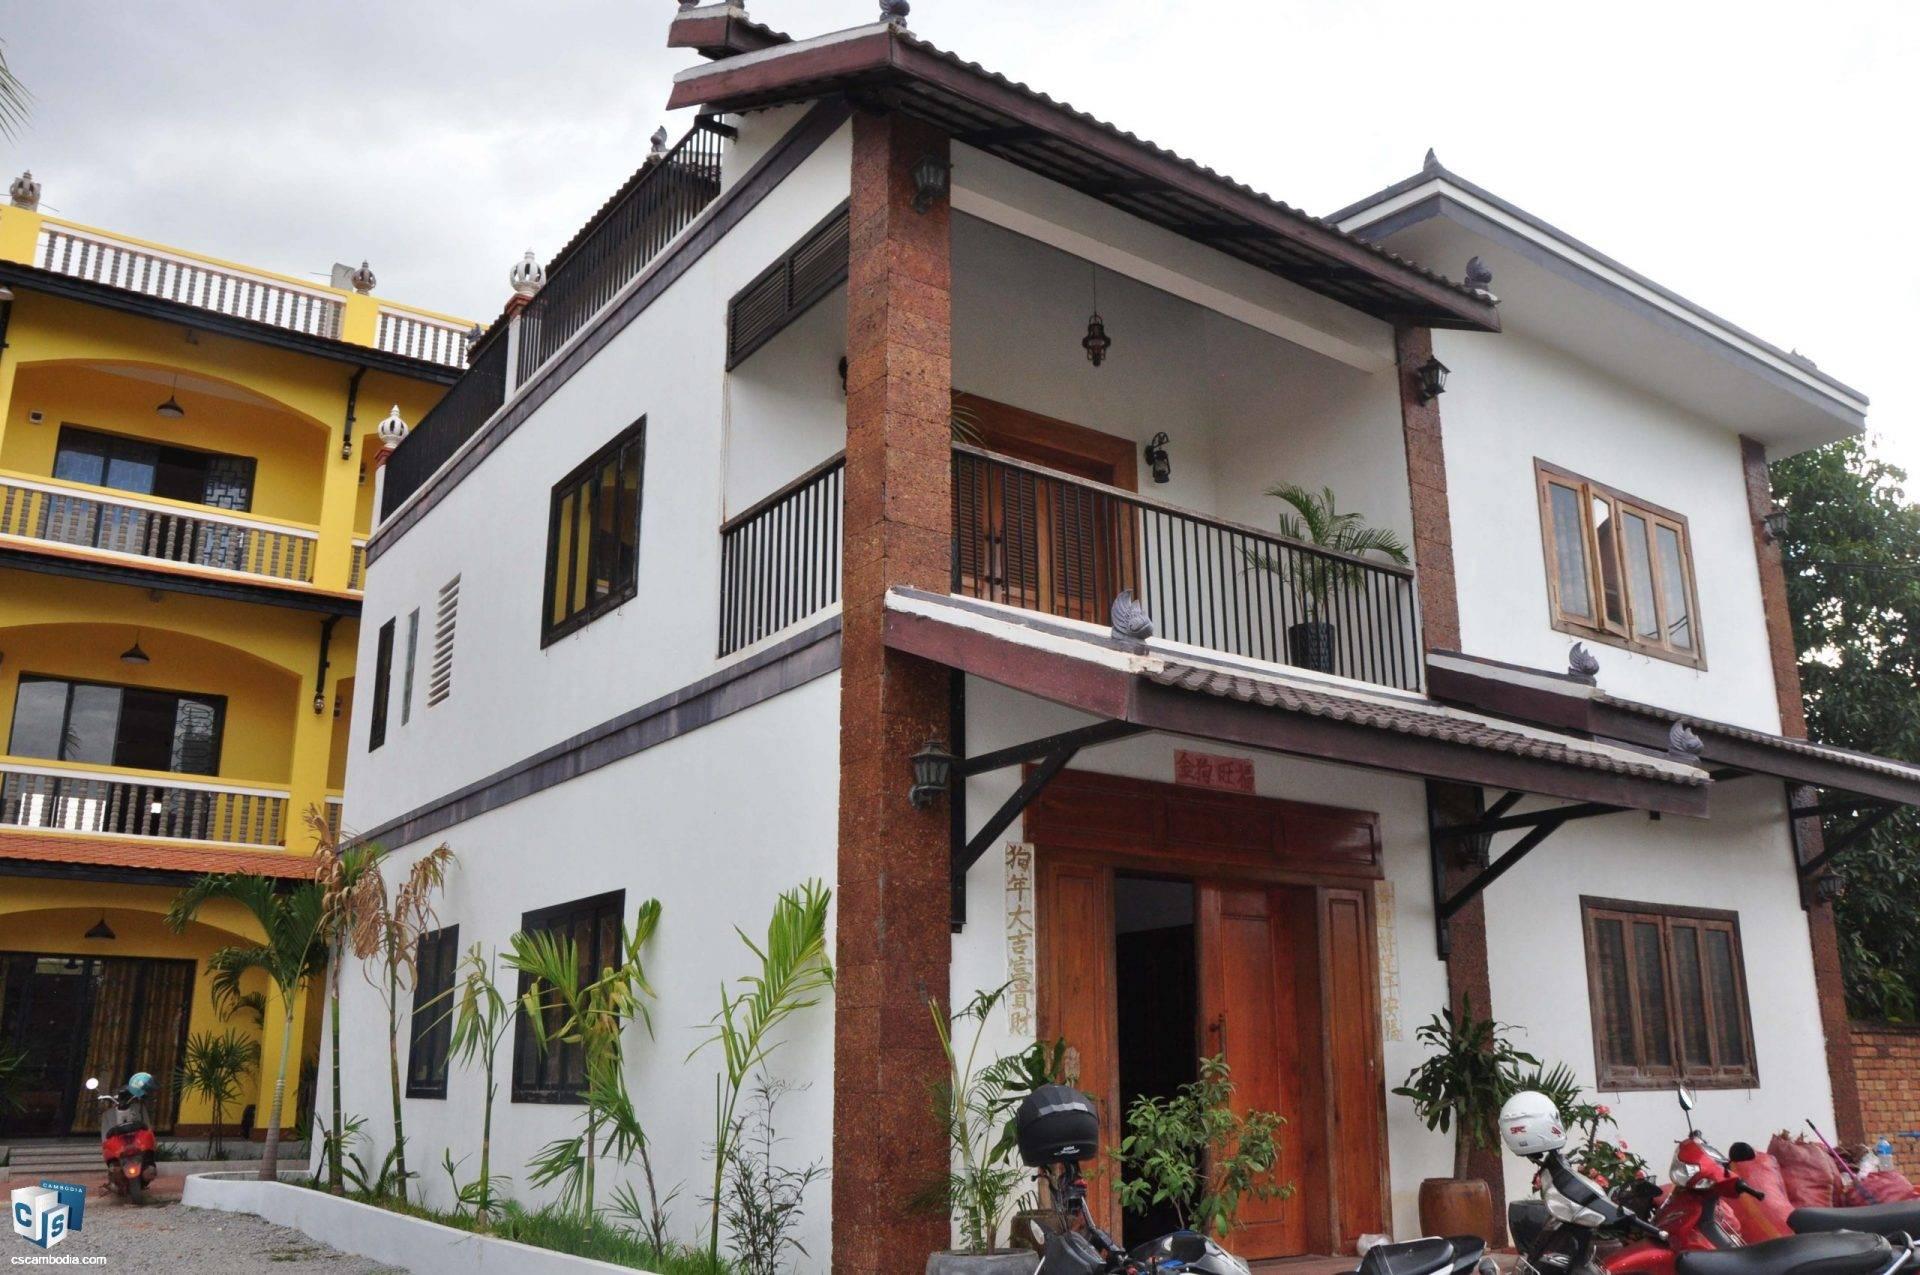 3 Bedroom House- For Rent- Sala Kamreuk Commune, Siem Reap